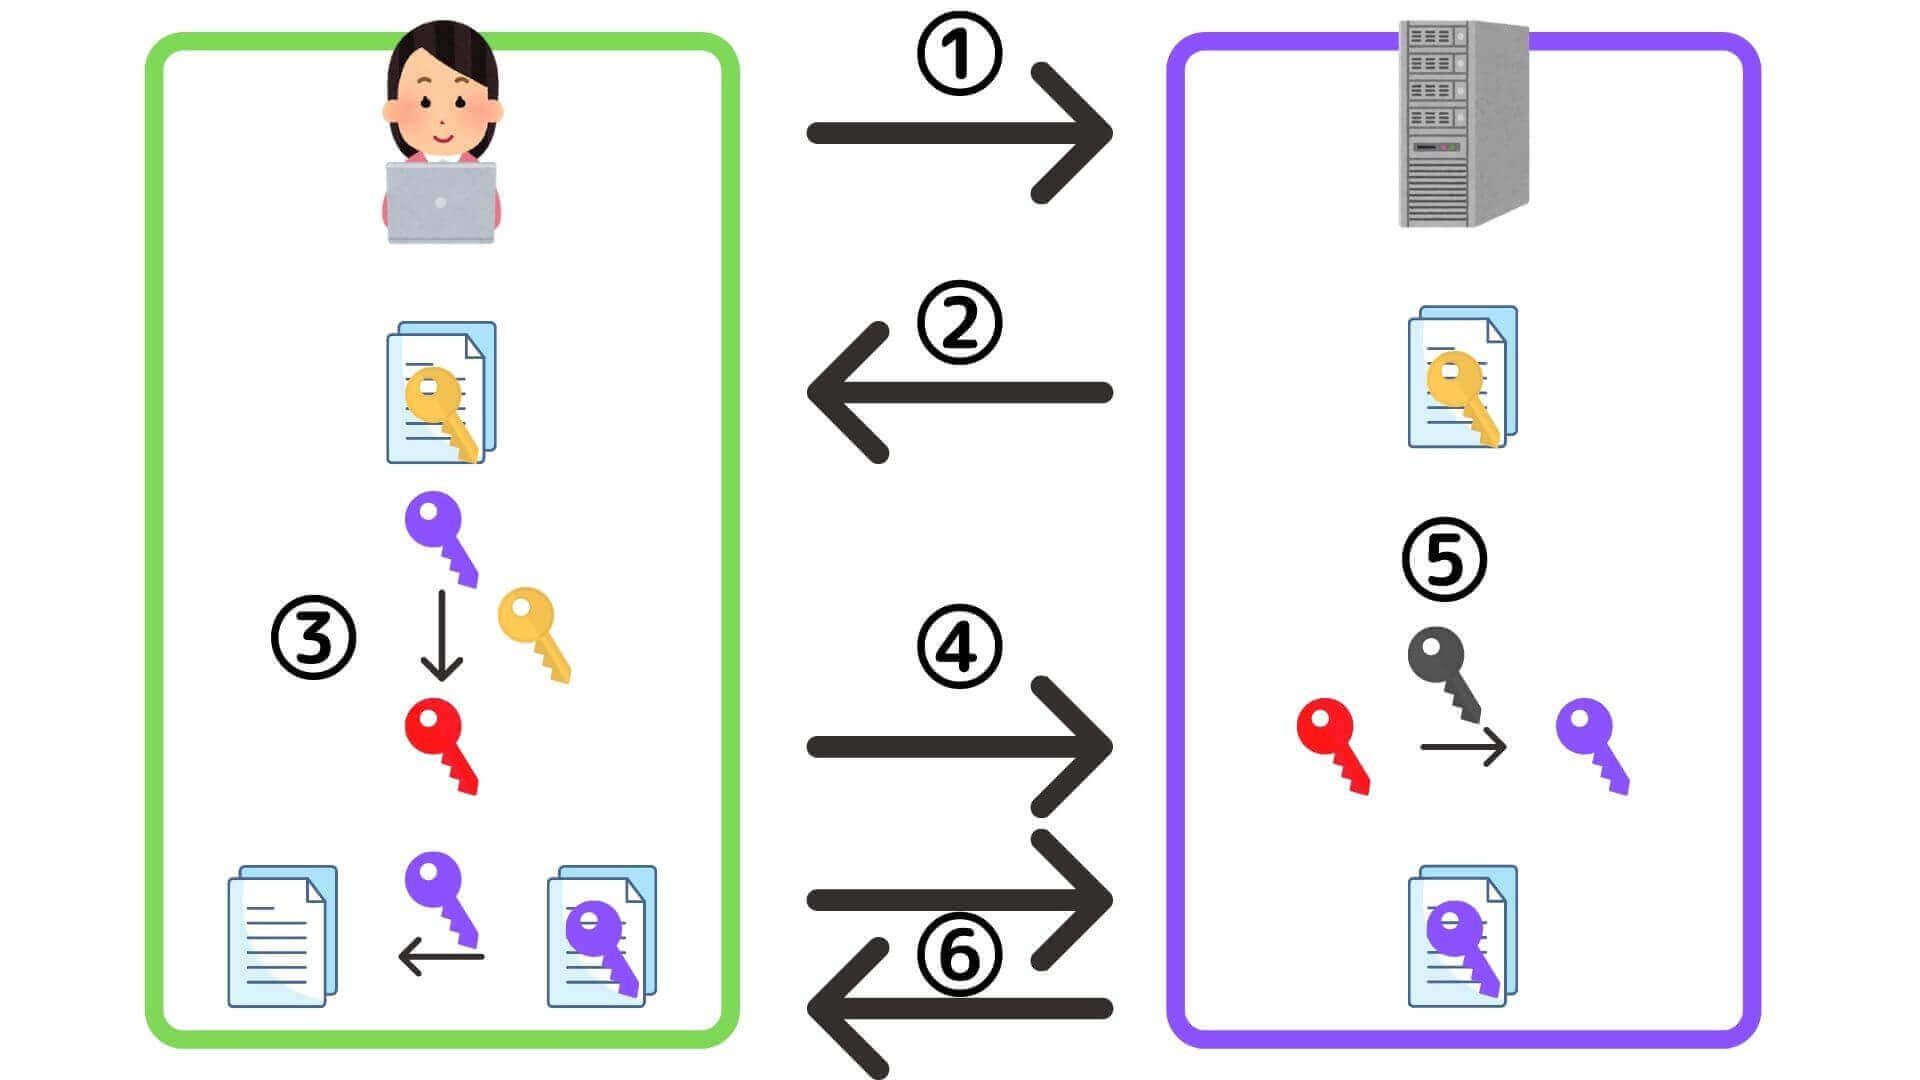 ApacheでのHTTPS通信(SSL/TLS暗号化通信)の流れ